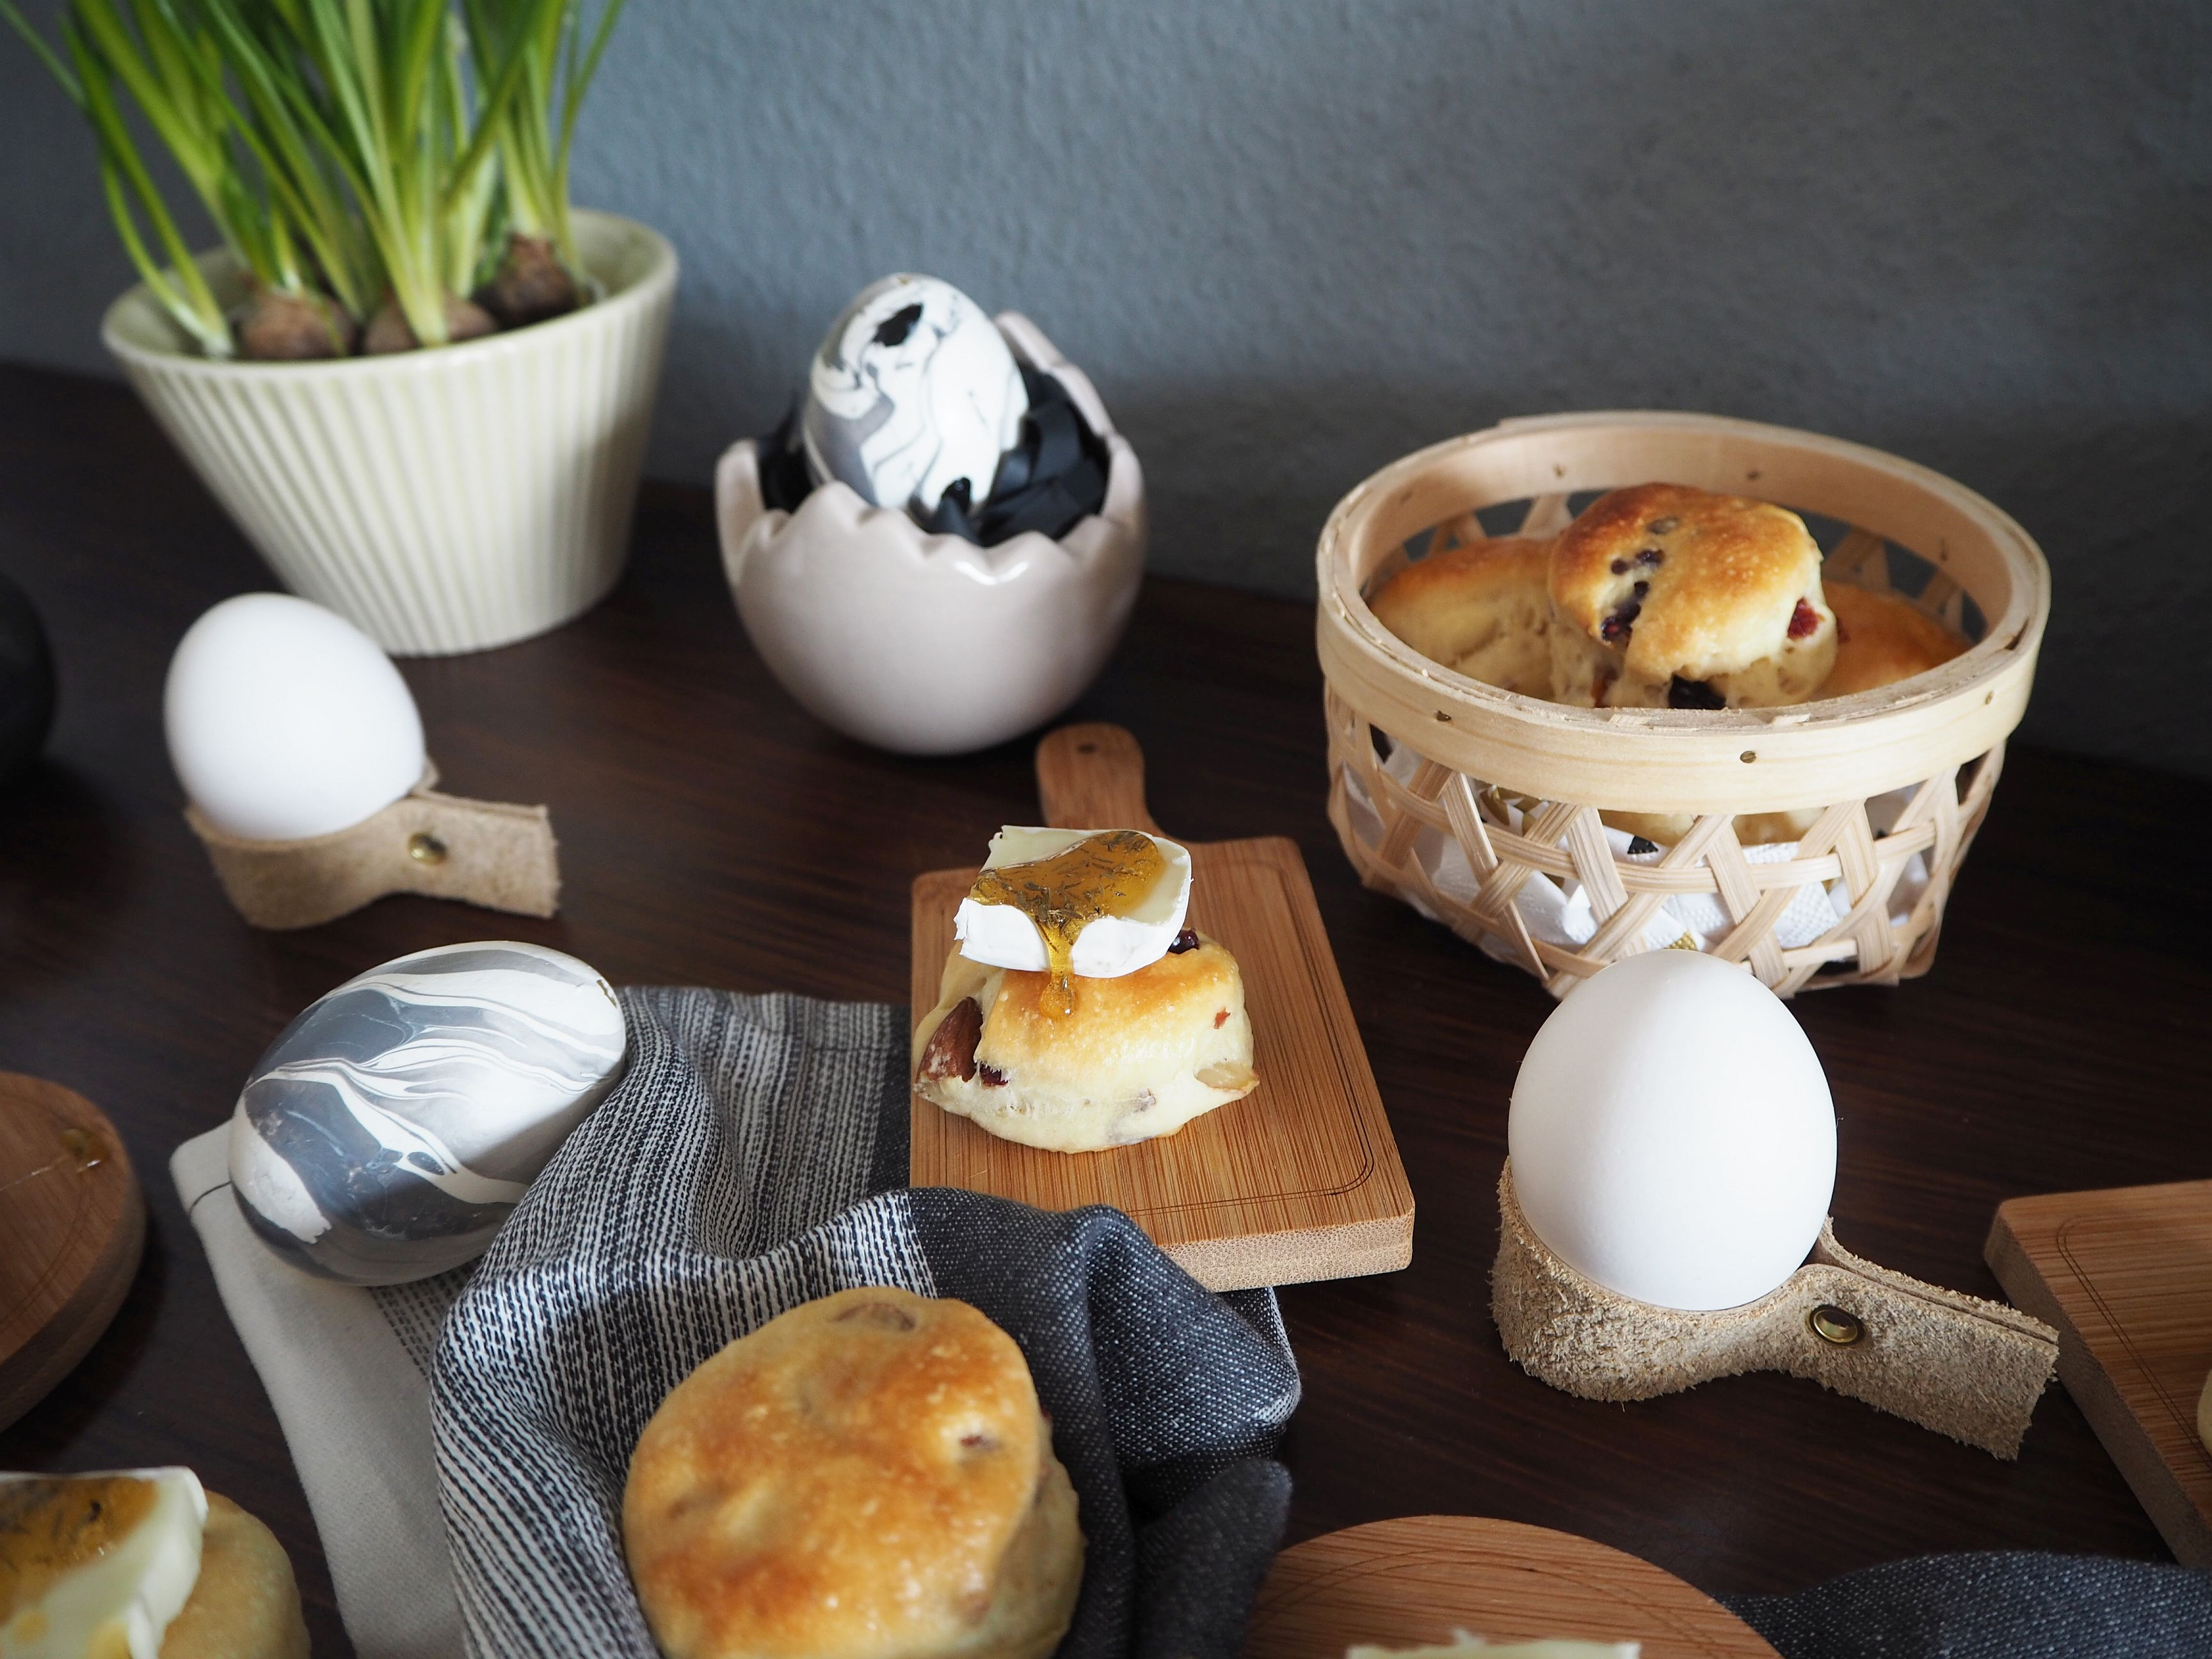 2018-03-skoen-och-kreativ-food-glad-pask-cranberry-mandel-broetchen-ostern (10)